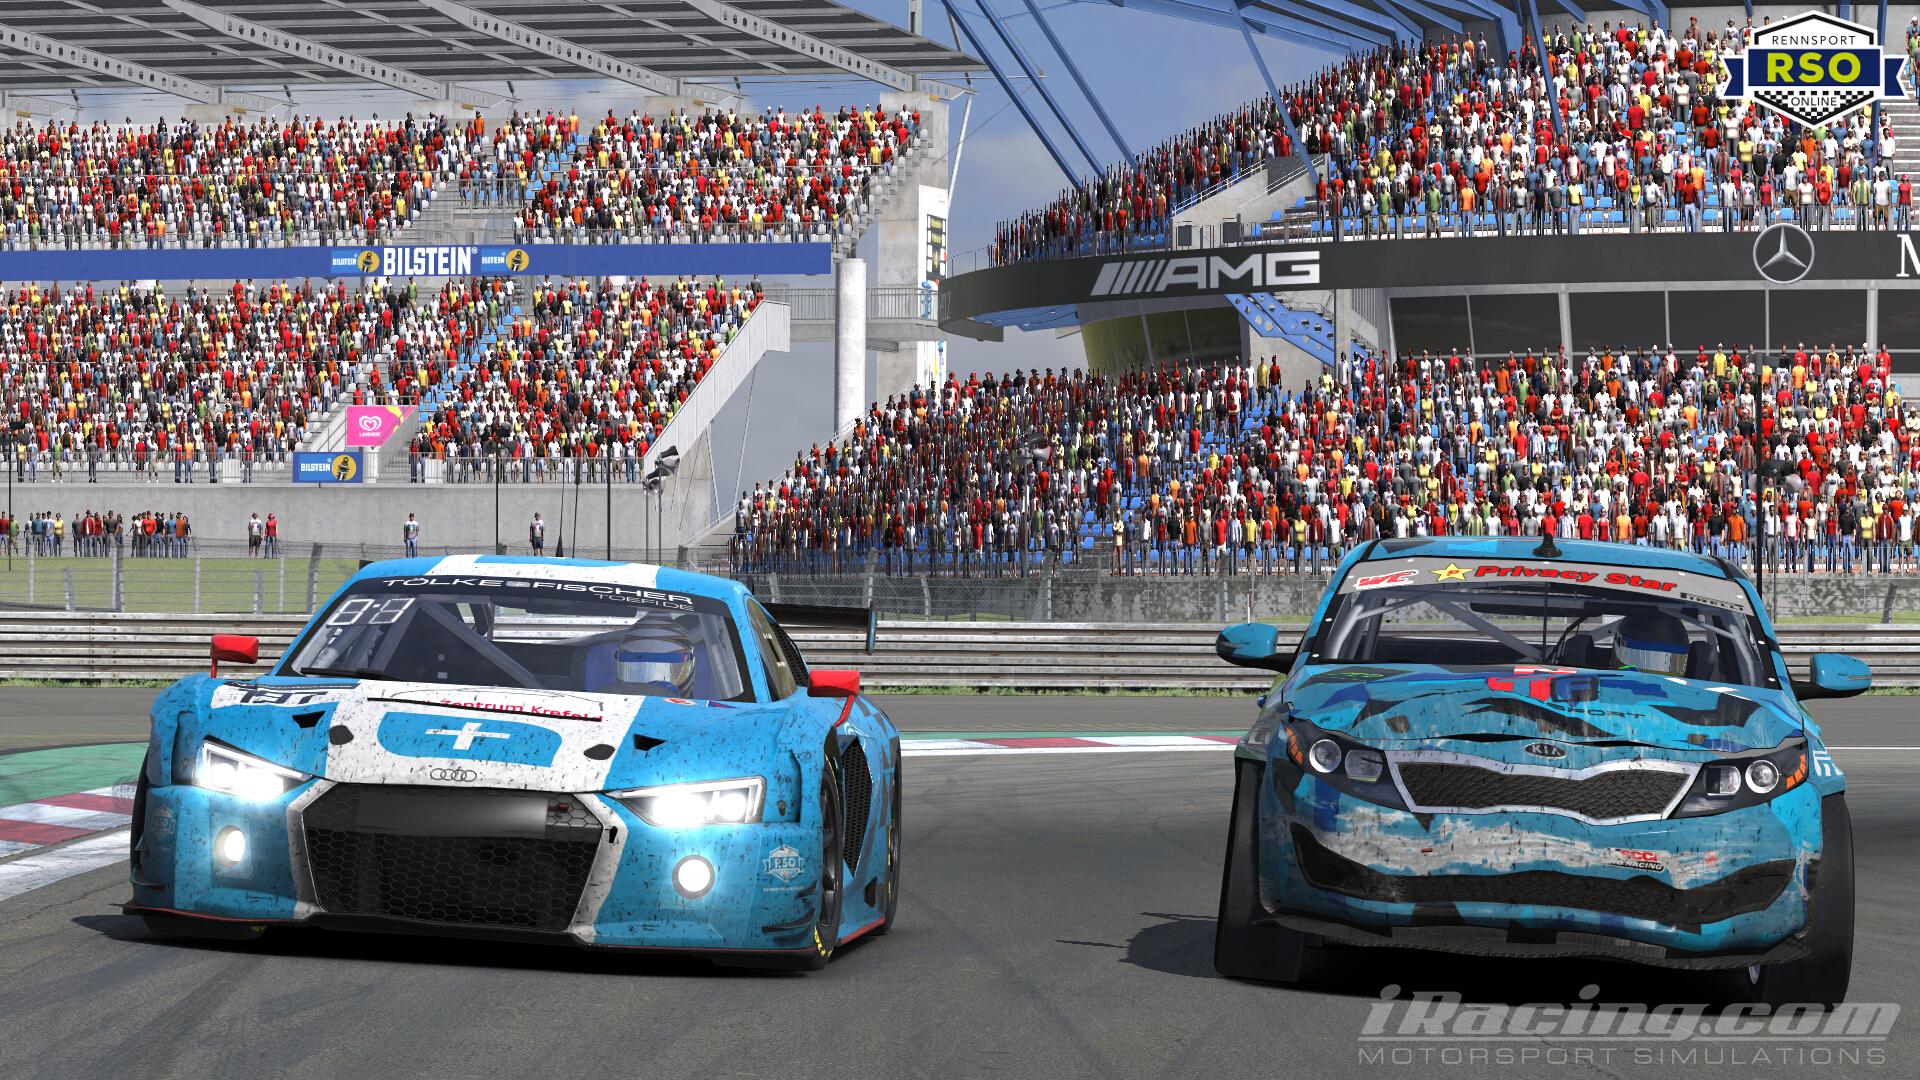 RSO 24h Nürburgring iRacing